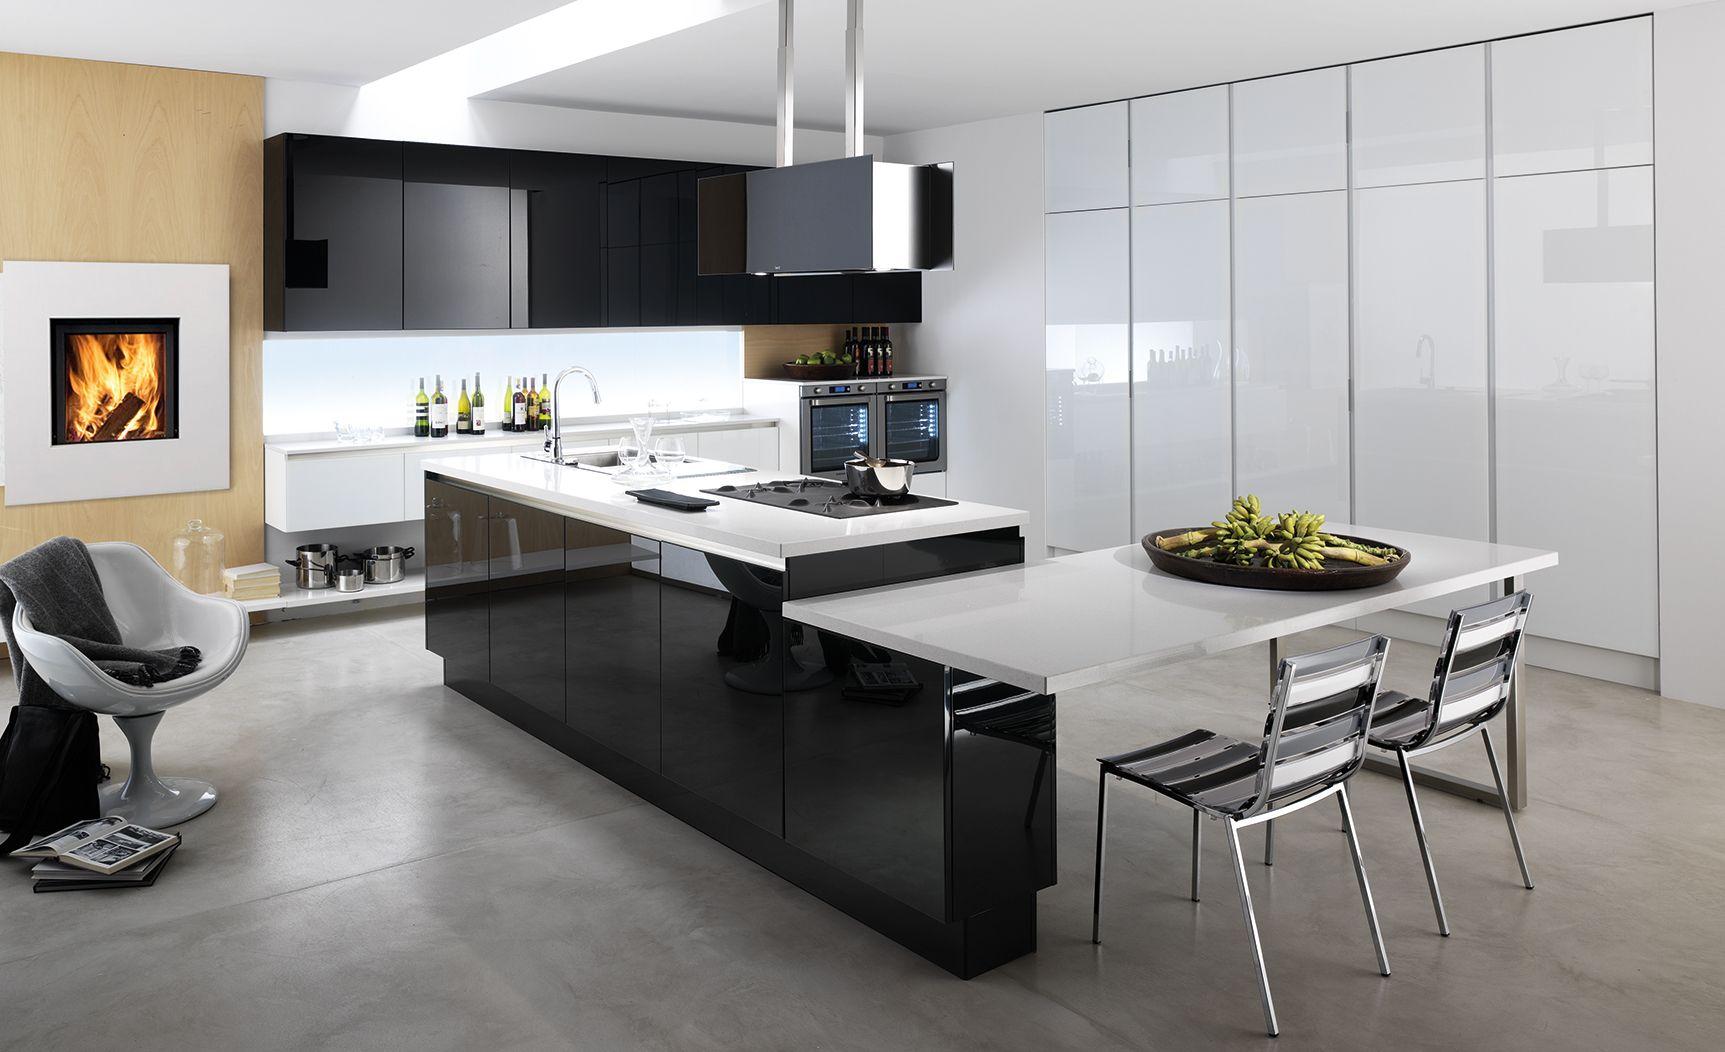 Cucine Italiane Biefbi modello RomaBiefbi Cucine   Kitchen, cucina ...